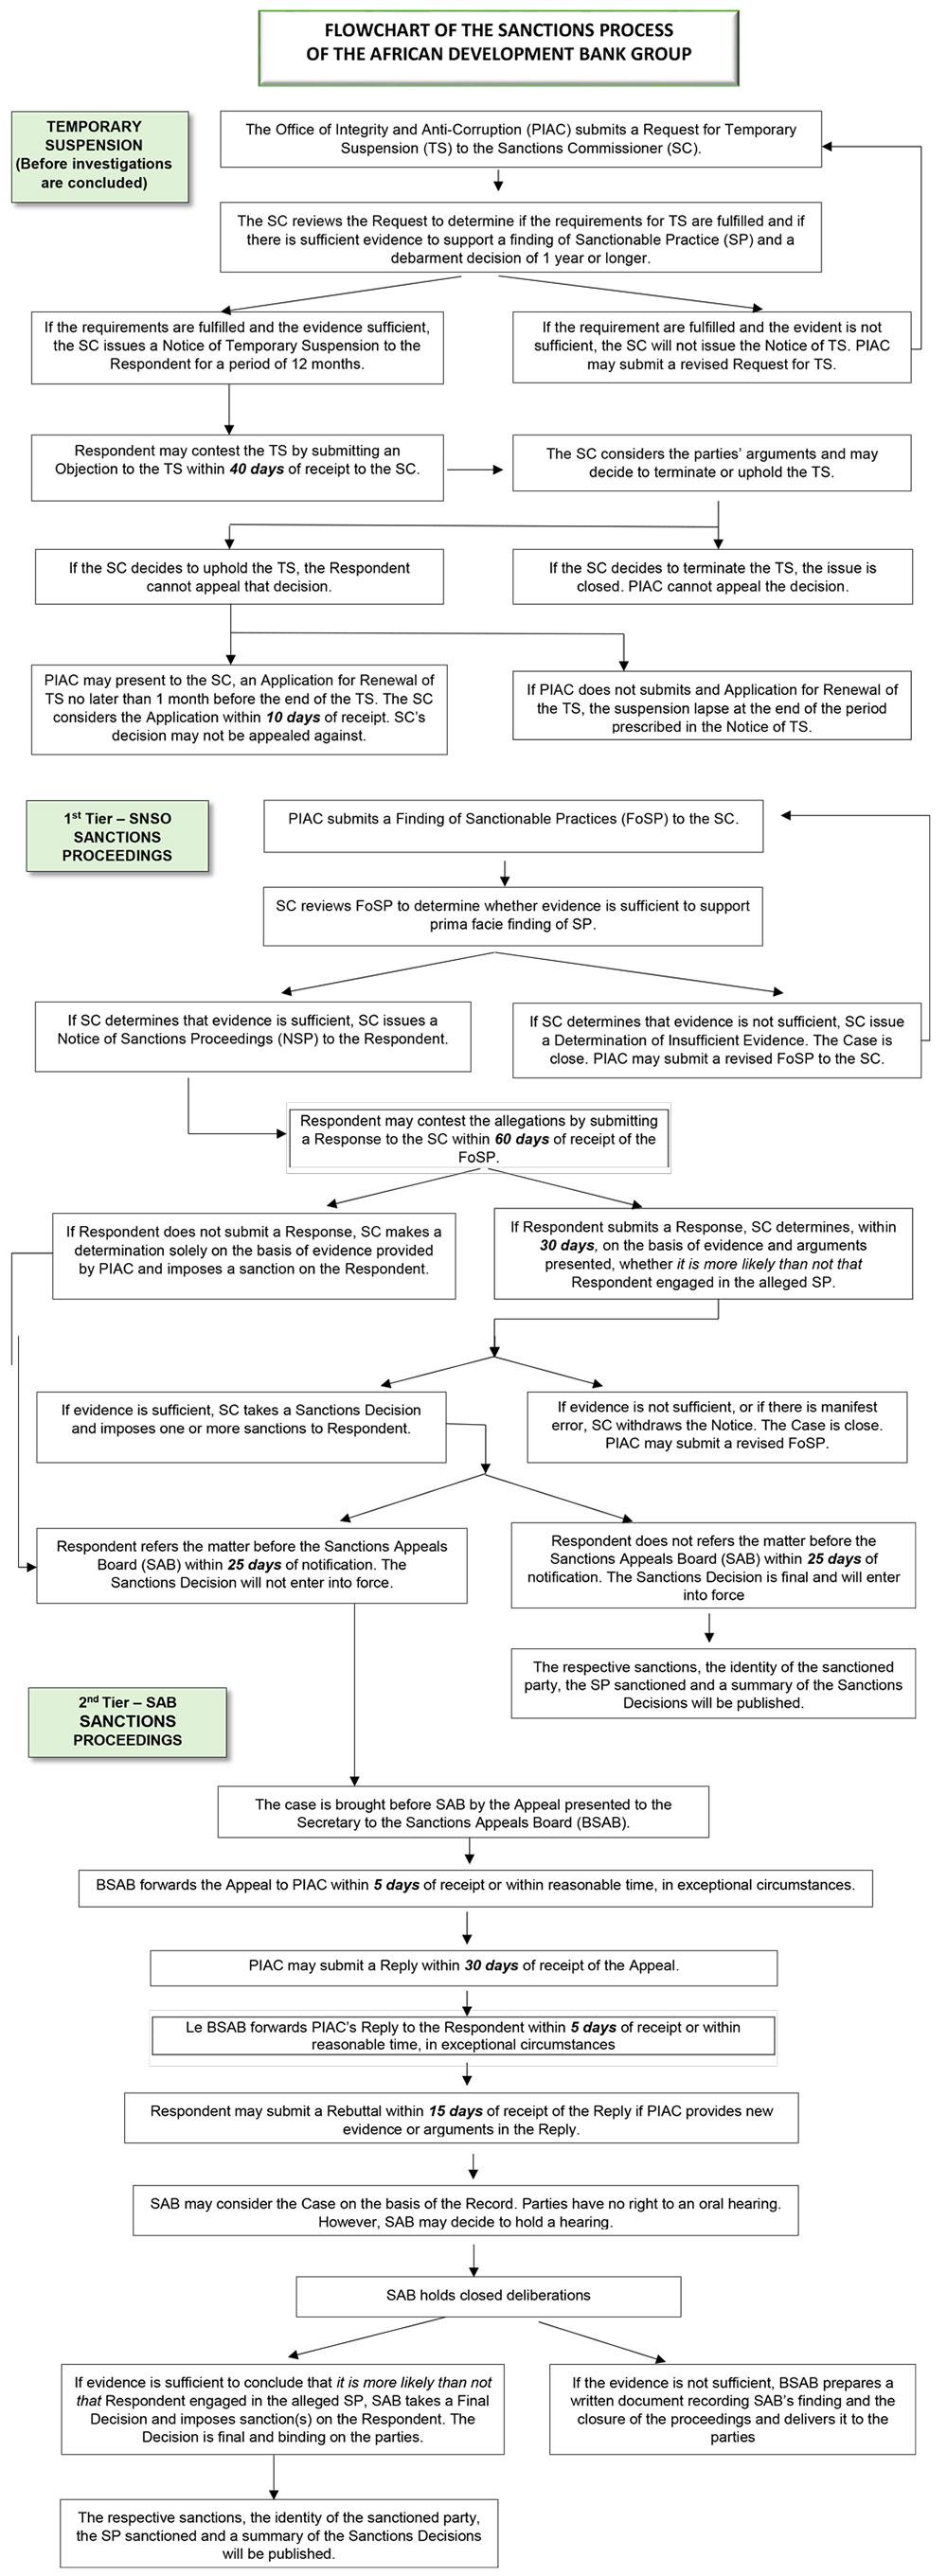 flow chart of the sanctions process